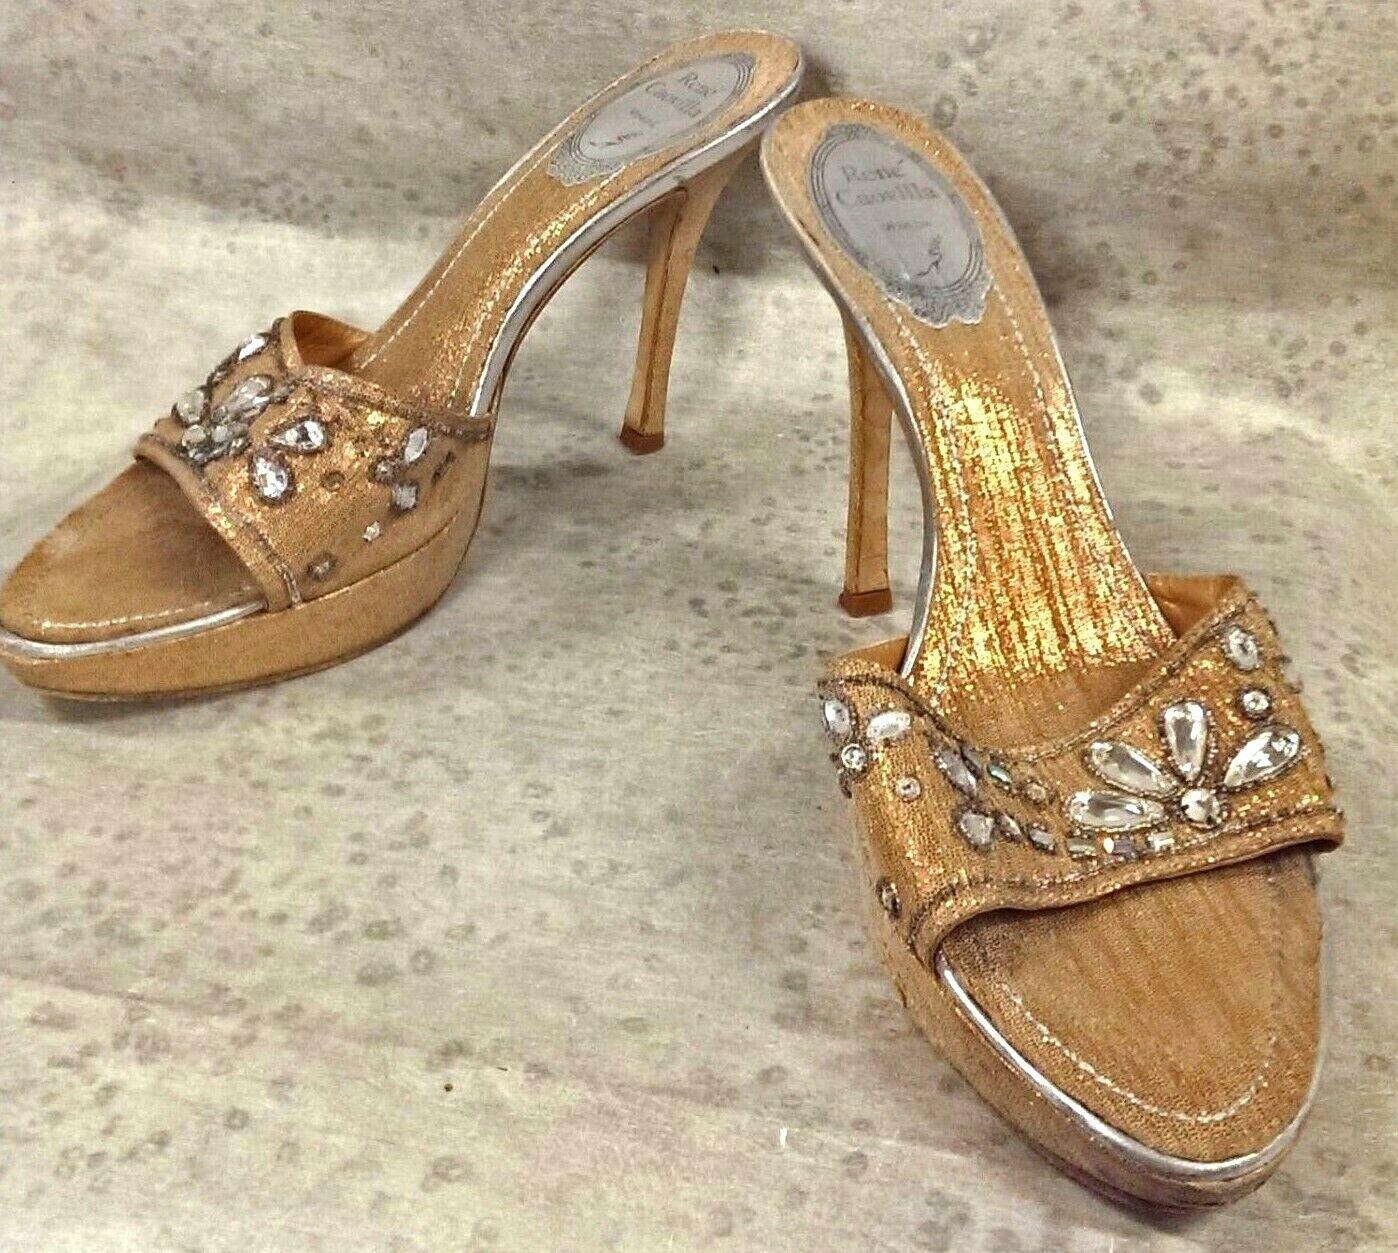 Rene Caovilla crystal high heel Sandals or shimmer 38.5 sz 7.5 M